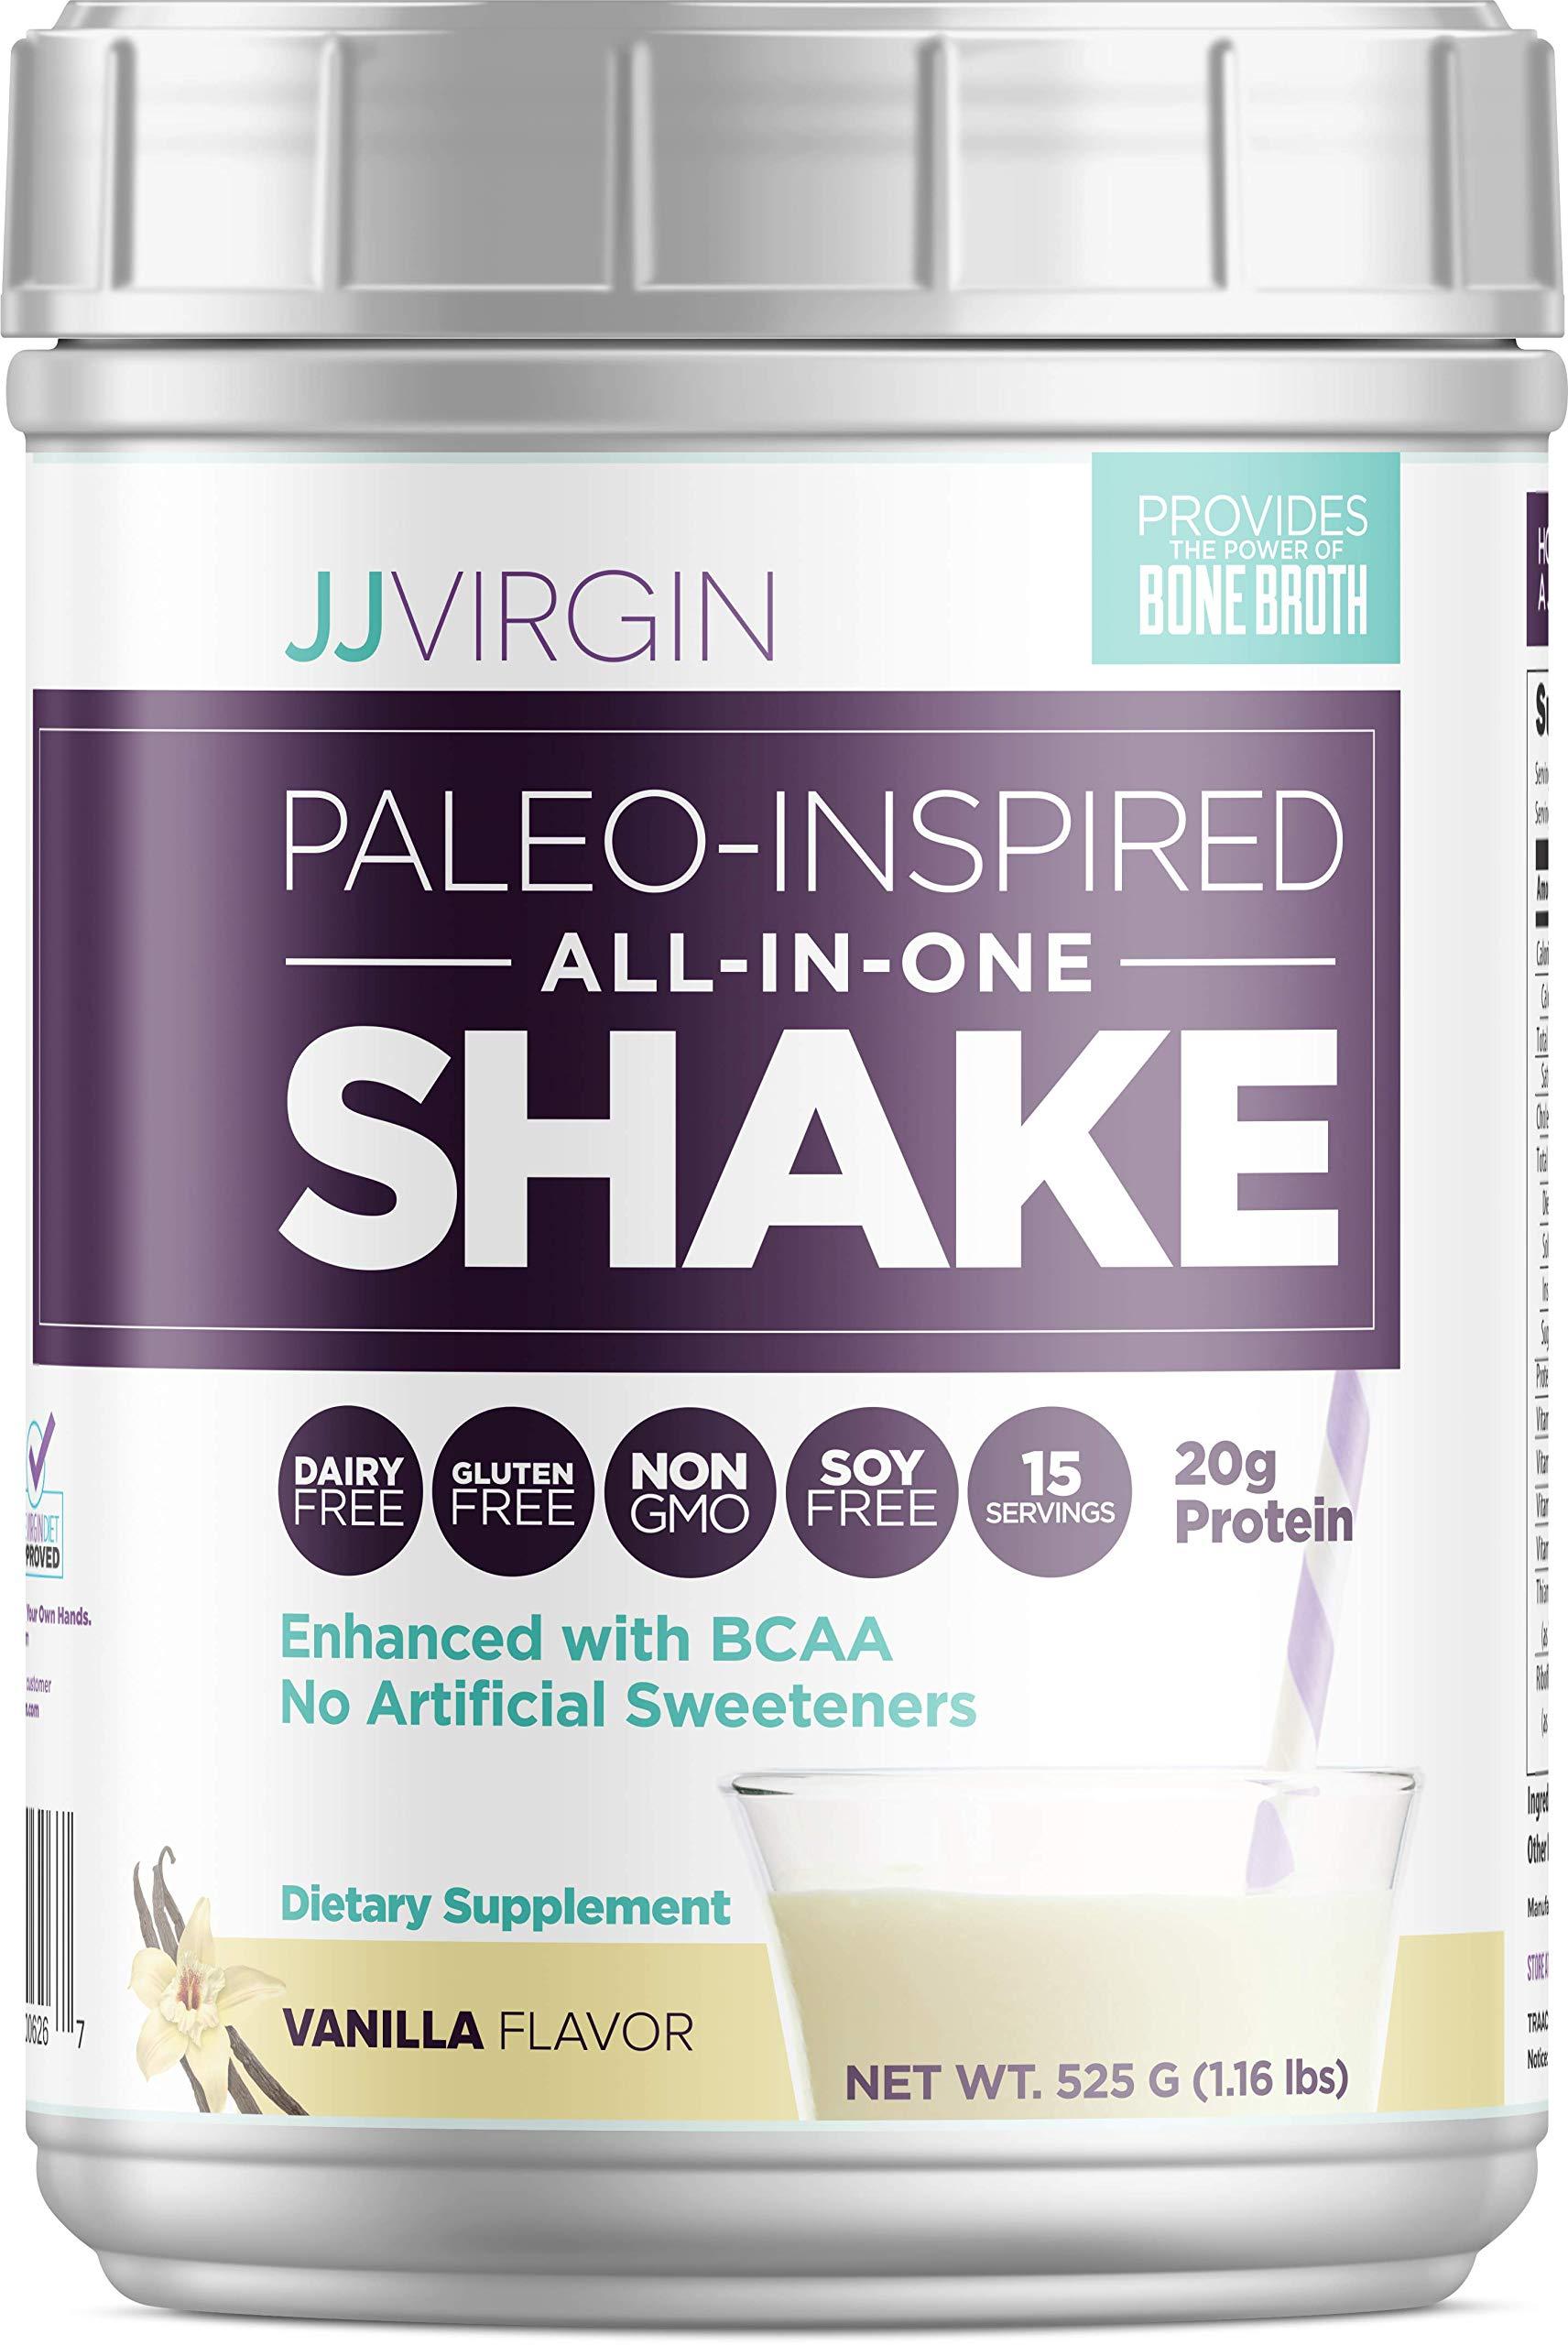 JJ Virgin Vanilla Paleo-Inspired All-in-One Shake - Paleo + Keto-Friendly Protein Powder (15 Servings, 1.16 Pounds) by JJ VIRGIN